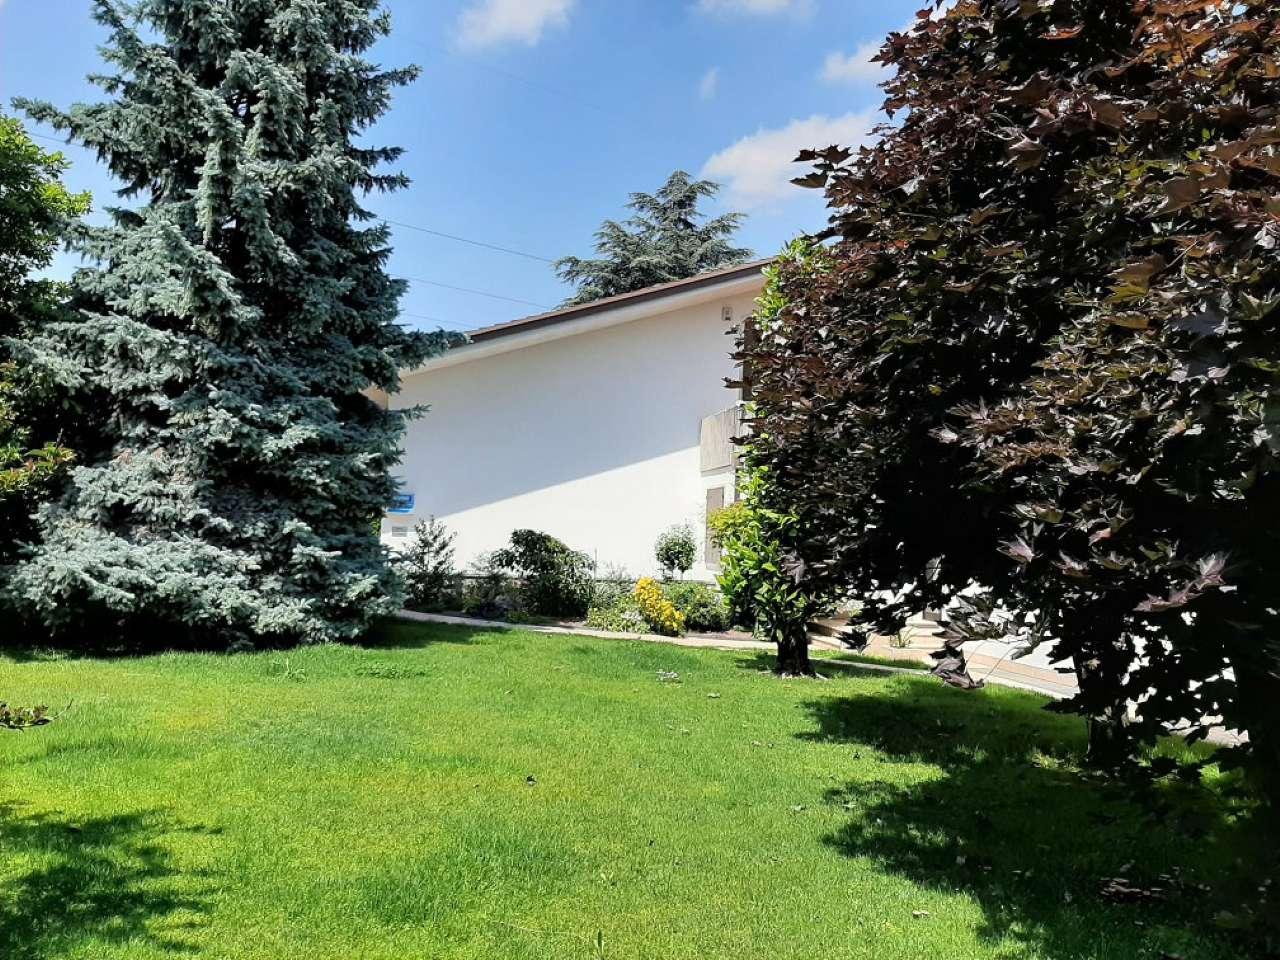 Bussolengo - Villa con giardino, foto 19